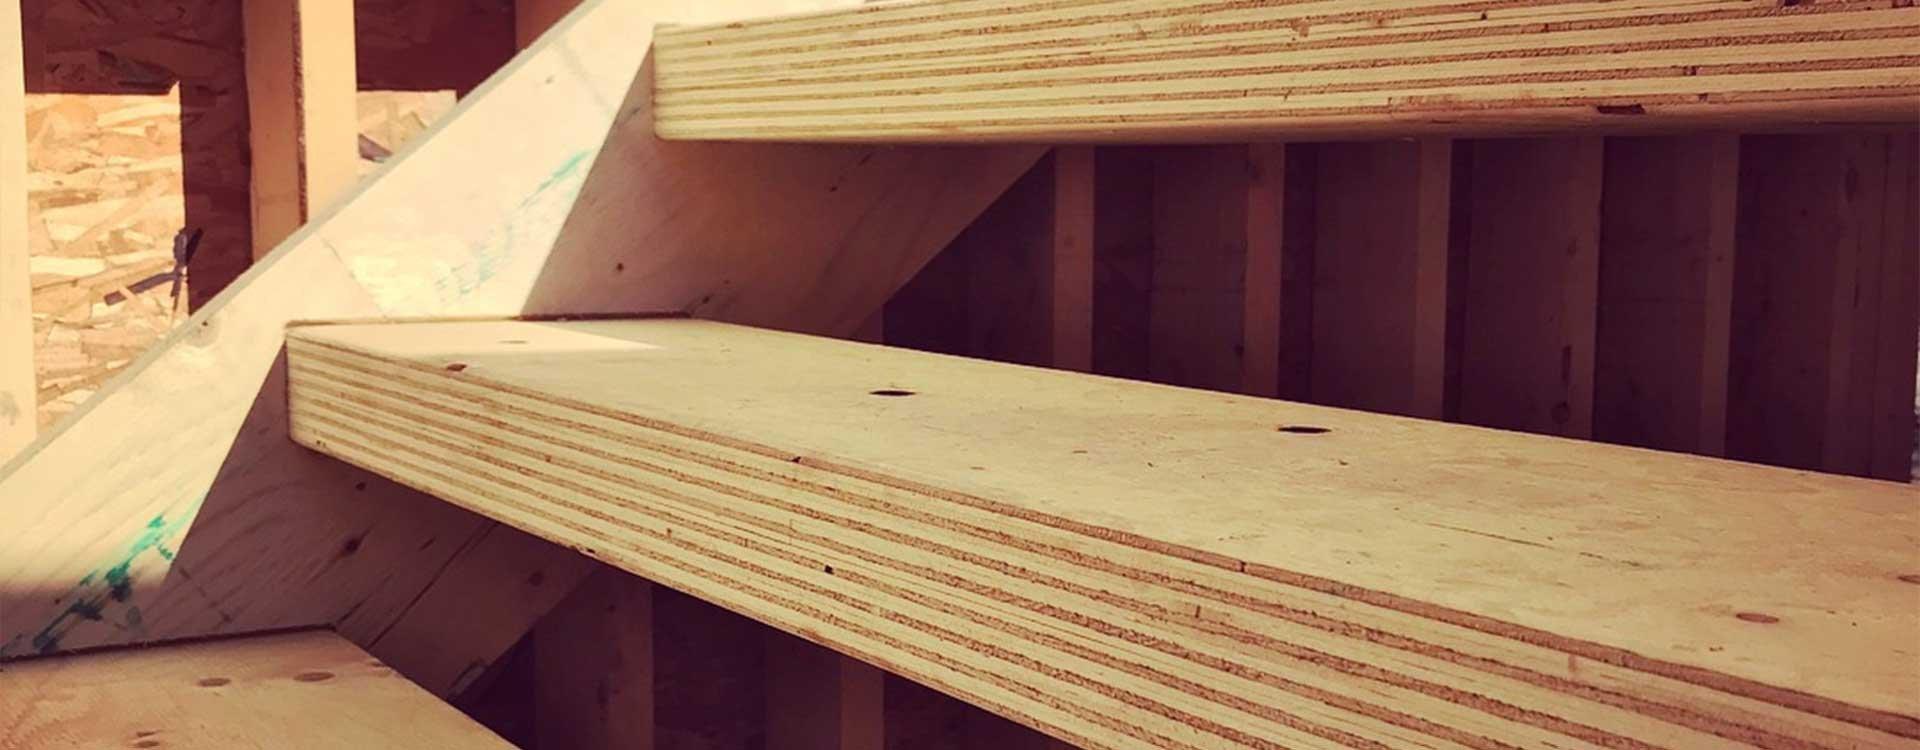 edmonton-home-builder-Kanvi-open-riserd-stair-cosntrucion